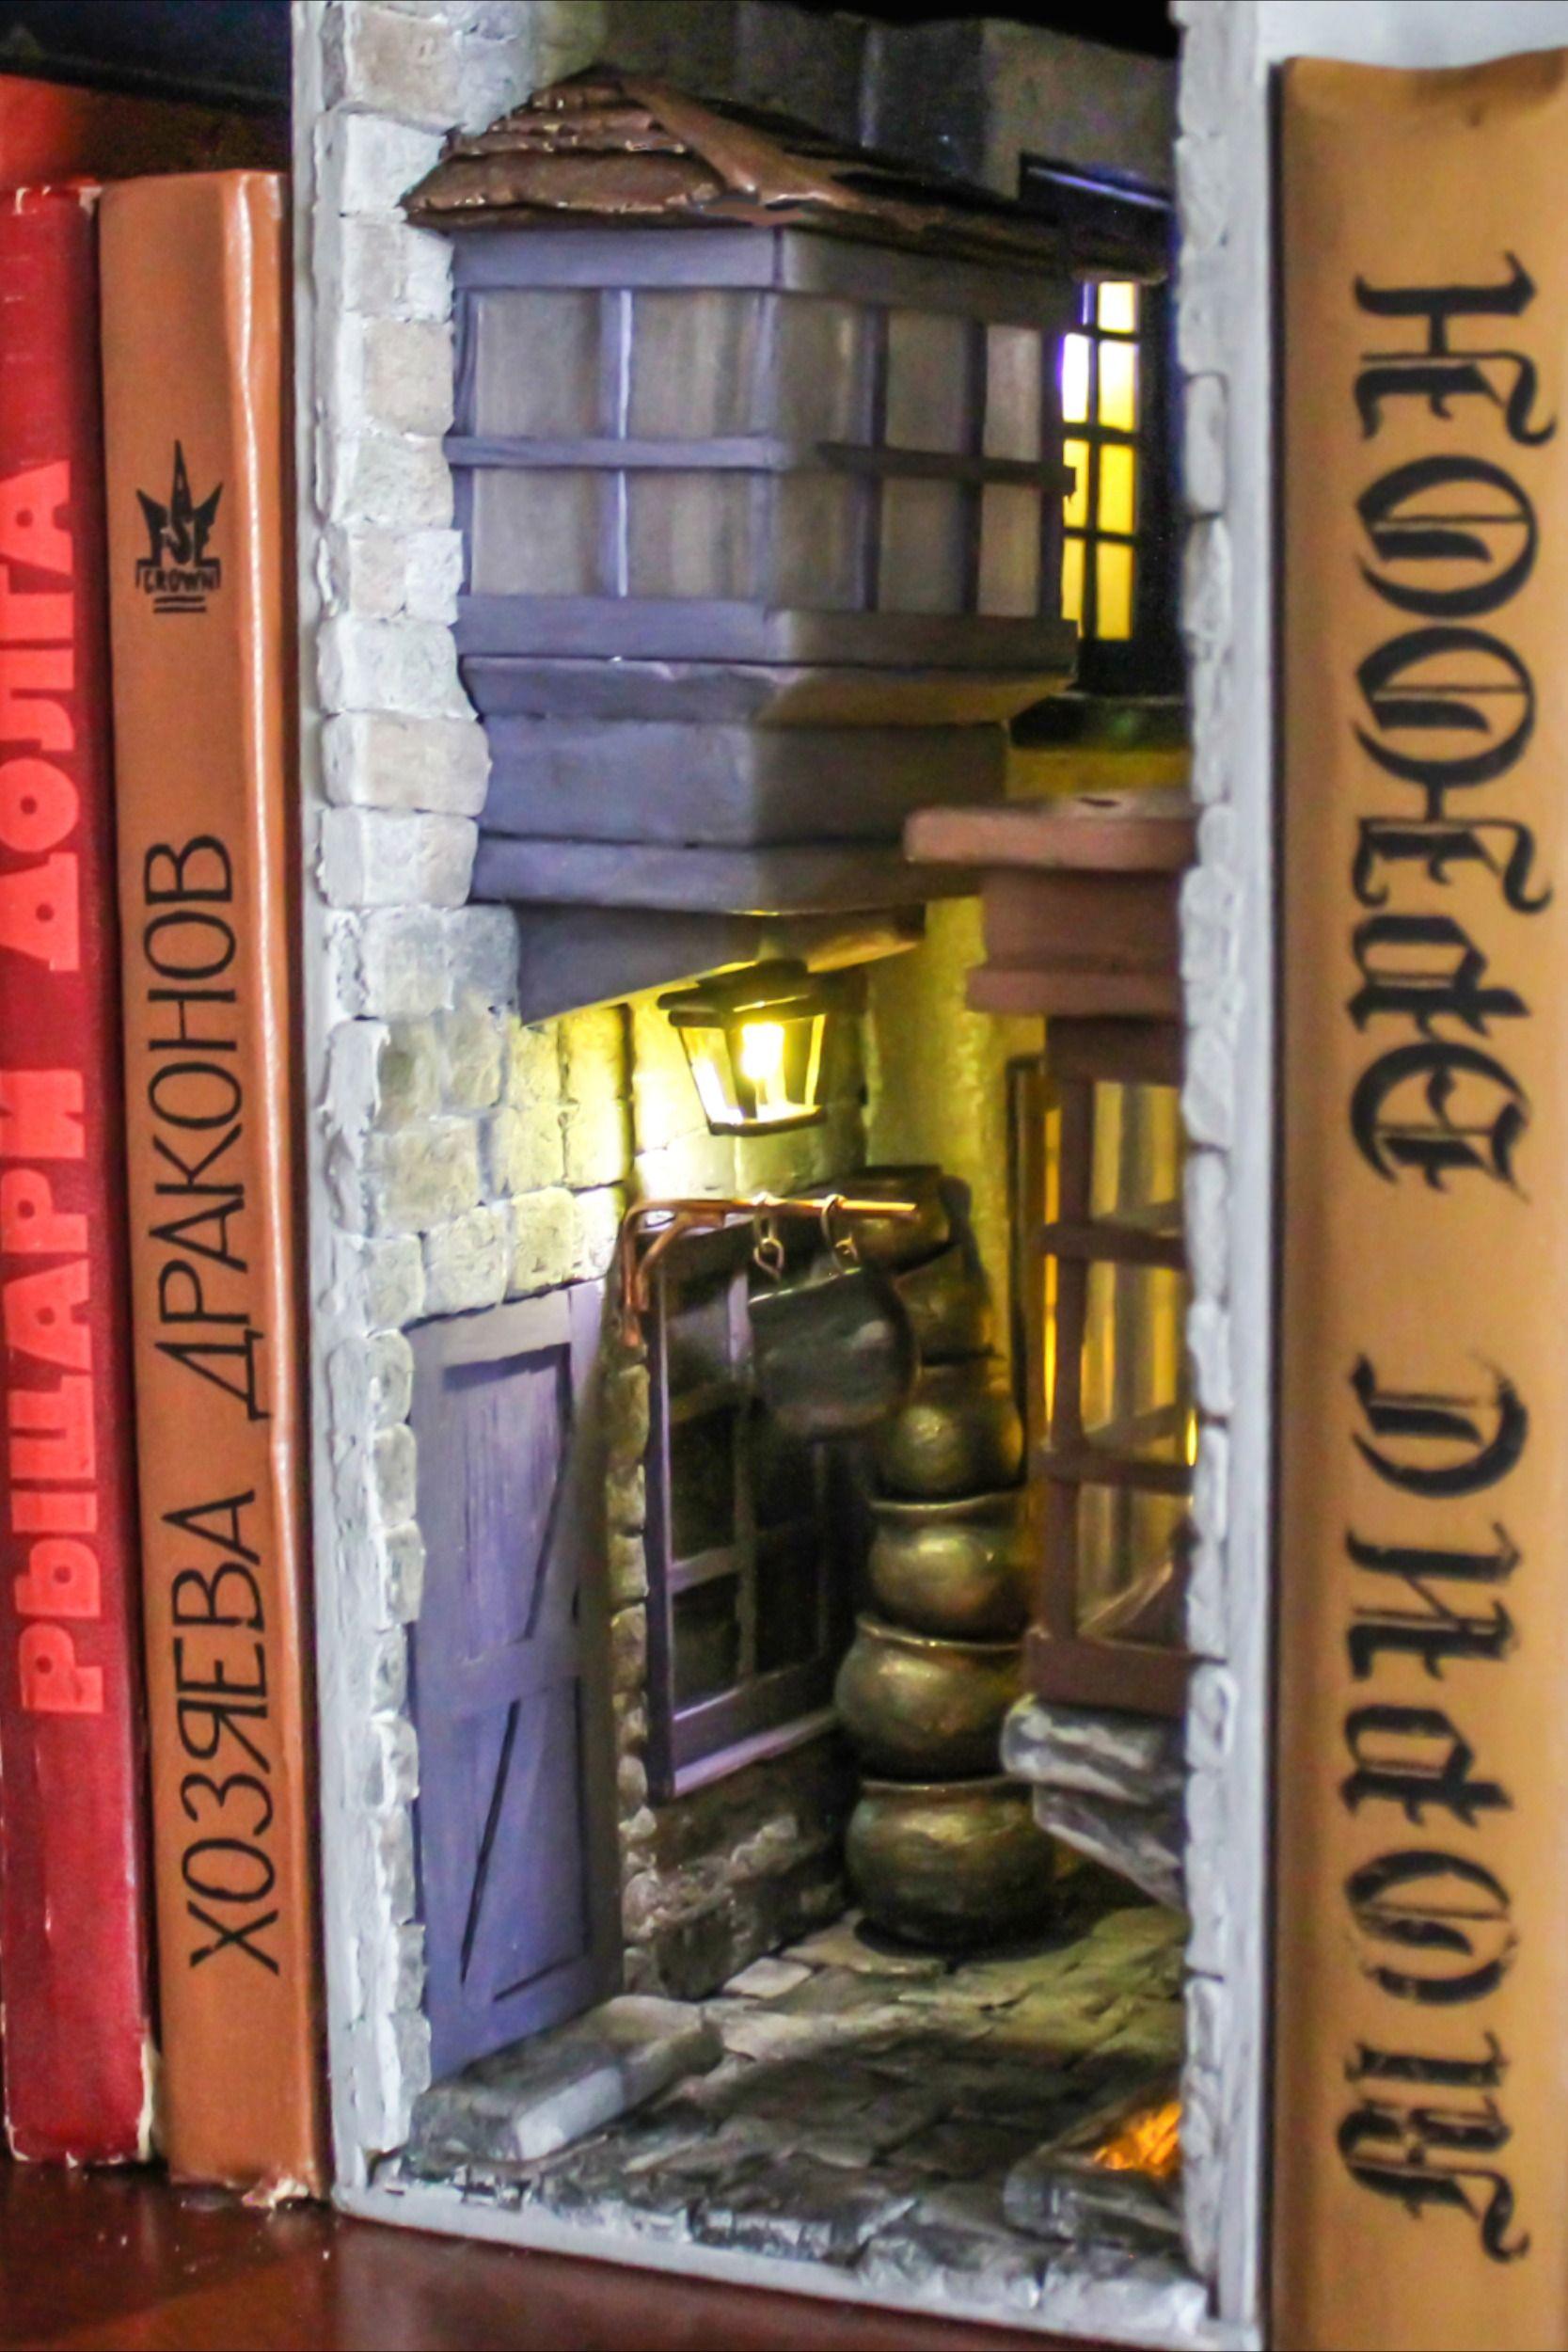 Book Nook Bookshelf Insert Harry Potter Diagon Alley Book End Etsy Book Nooks Harry Potter Room Decor Harry Potter Gifts Diy